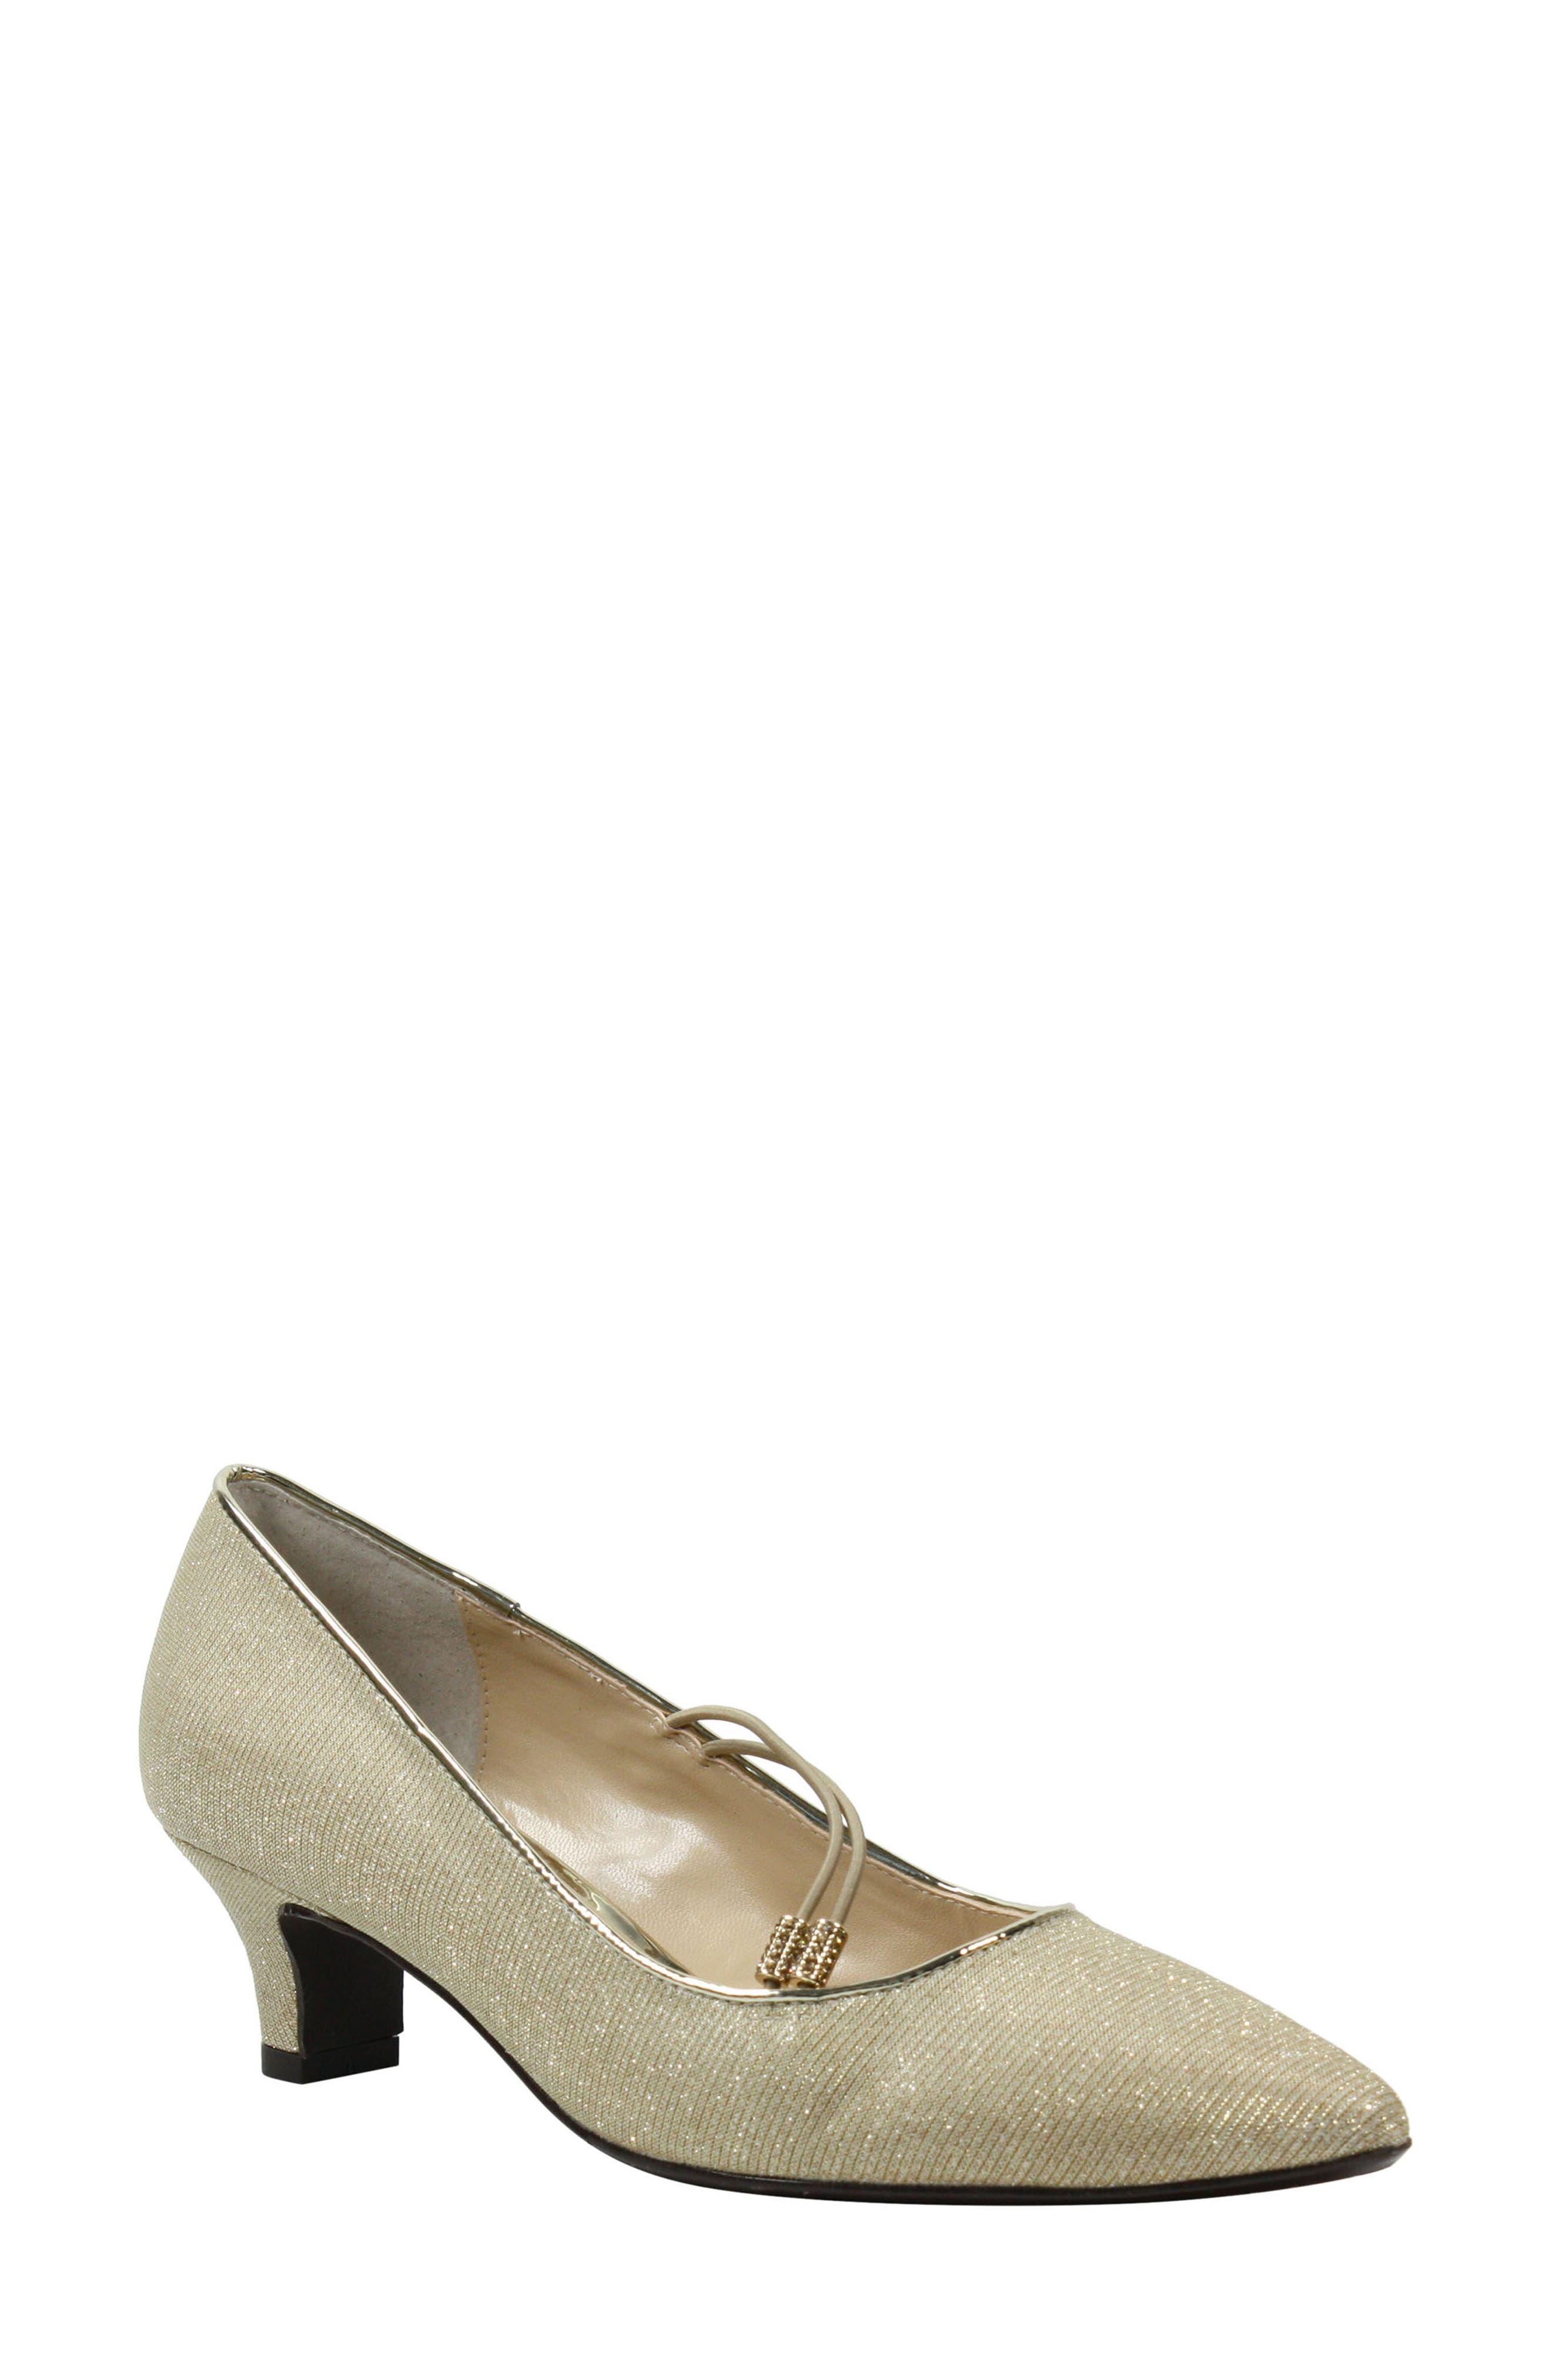 Women's J. Renee Idenah Pointed Toe Pump, Size 7 B - Metallic